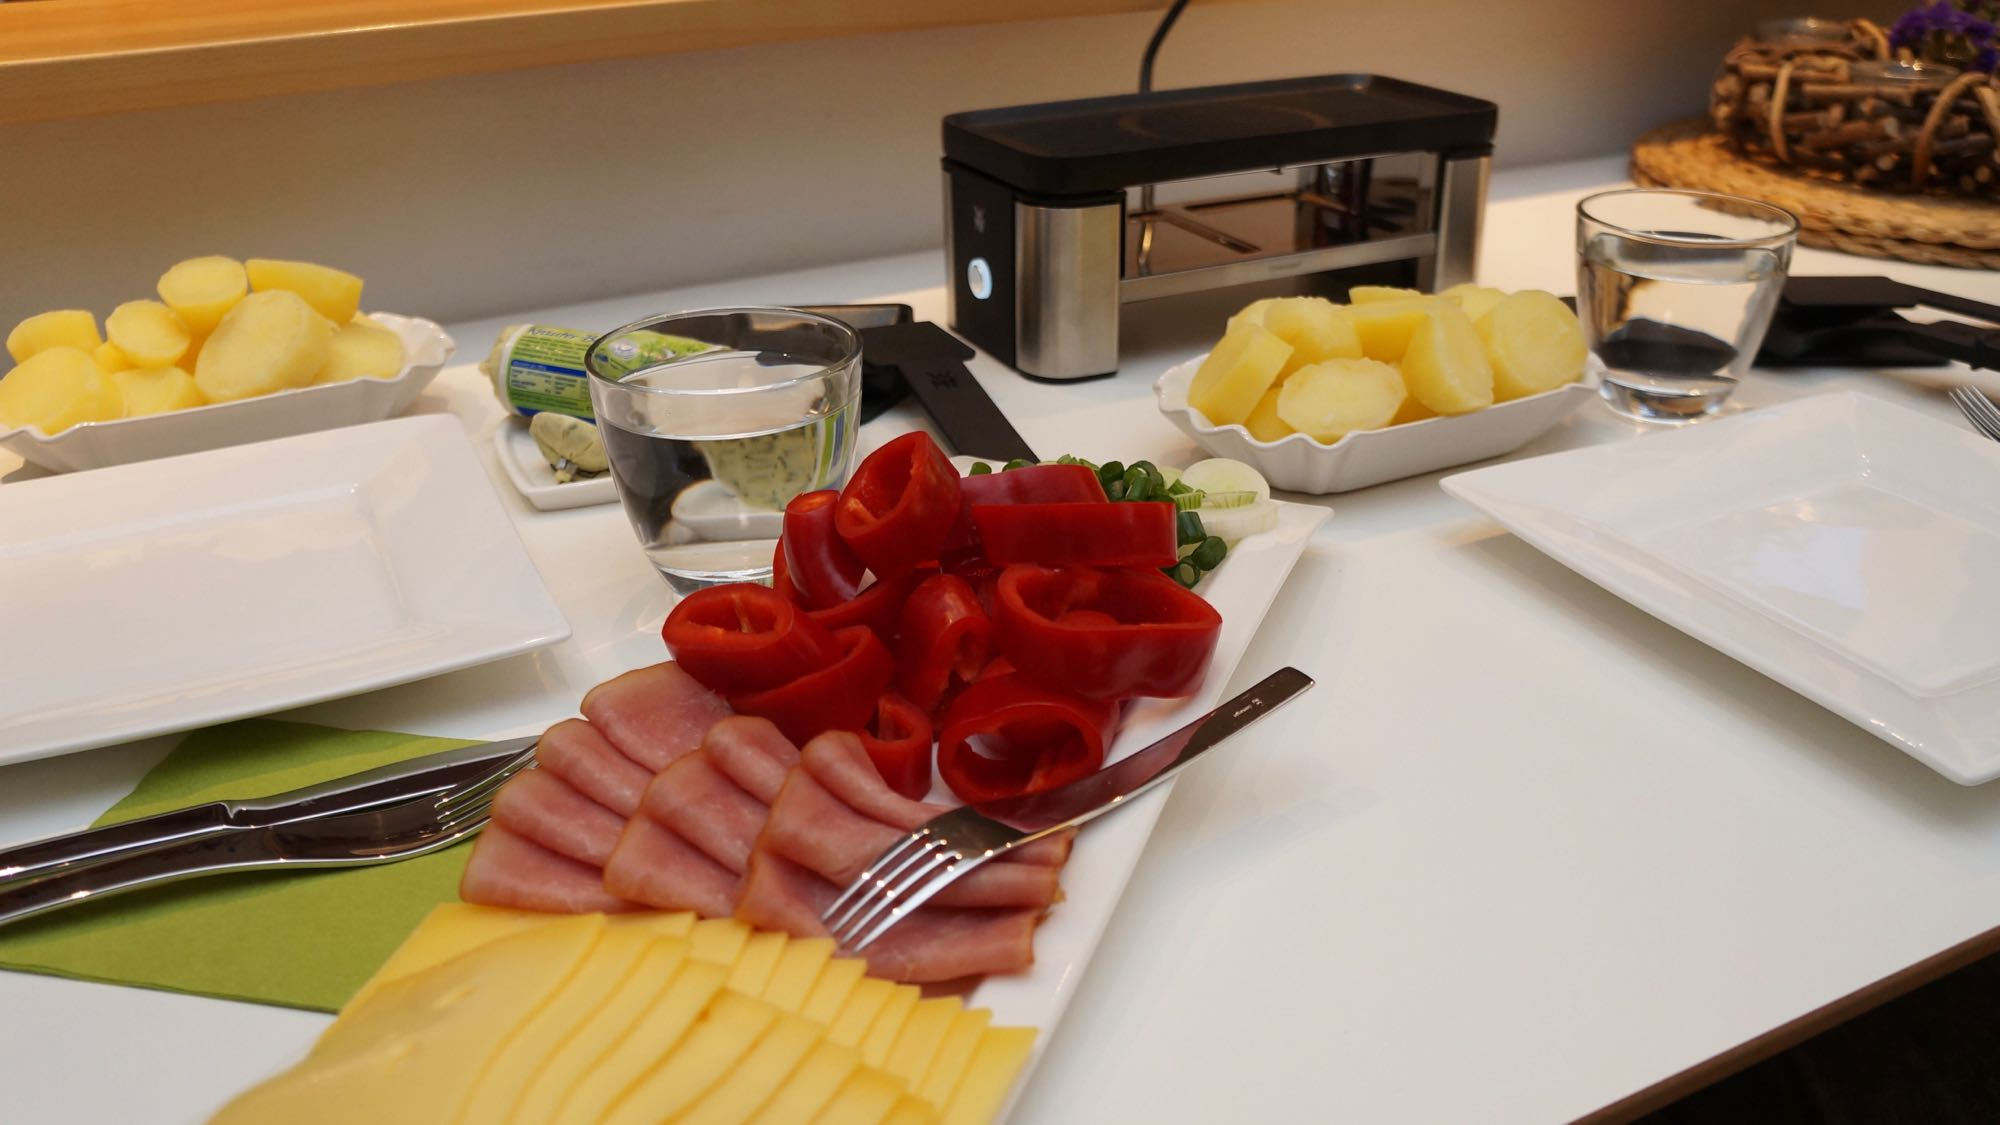 wmf raclette 7 bea 39 s kitchen. Black Bedroom Furniture Sets. Home Design Ideas